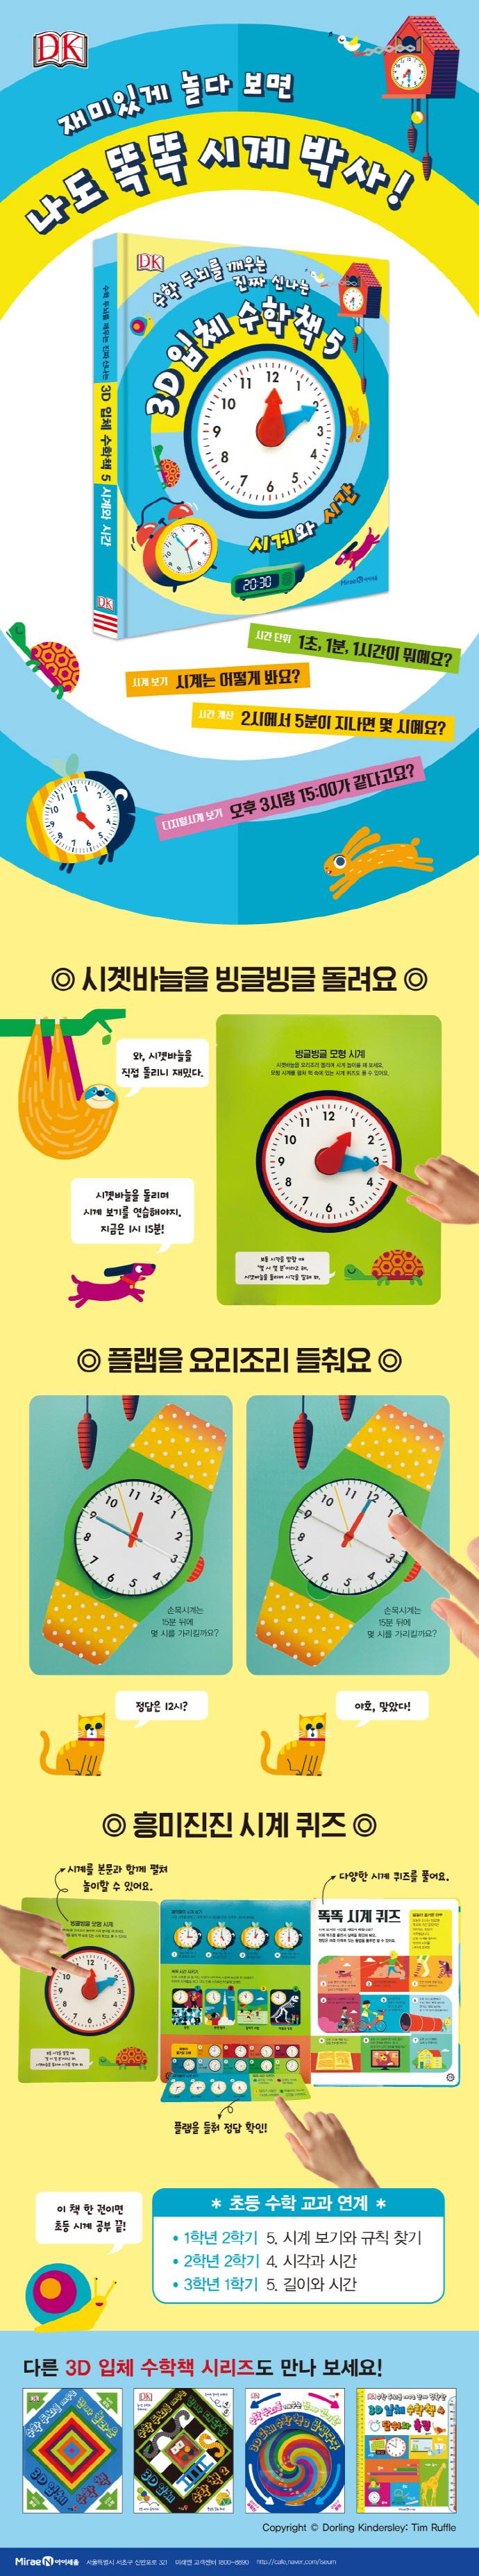 3D 입체 수학 책. 5: 시계와 시간(수학 두뇌를 깨우는 진짜 신나는)(양장본 HardCover) 도서 상세이미지